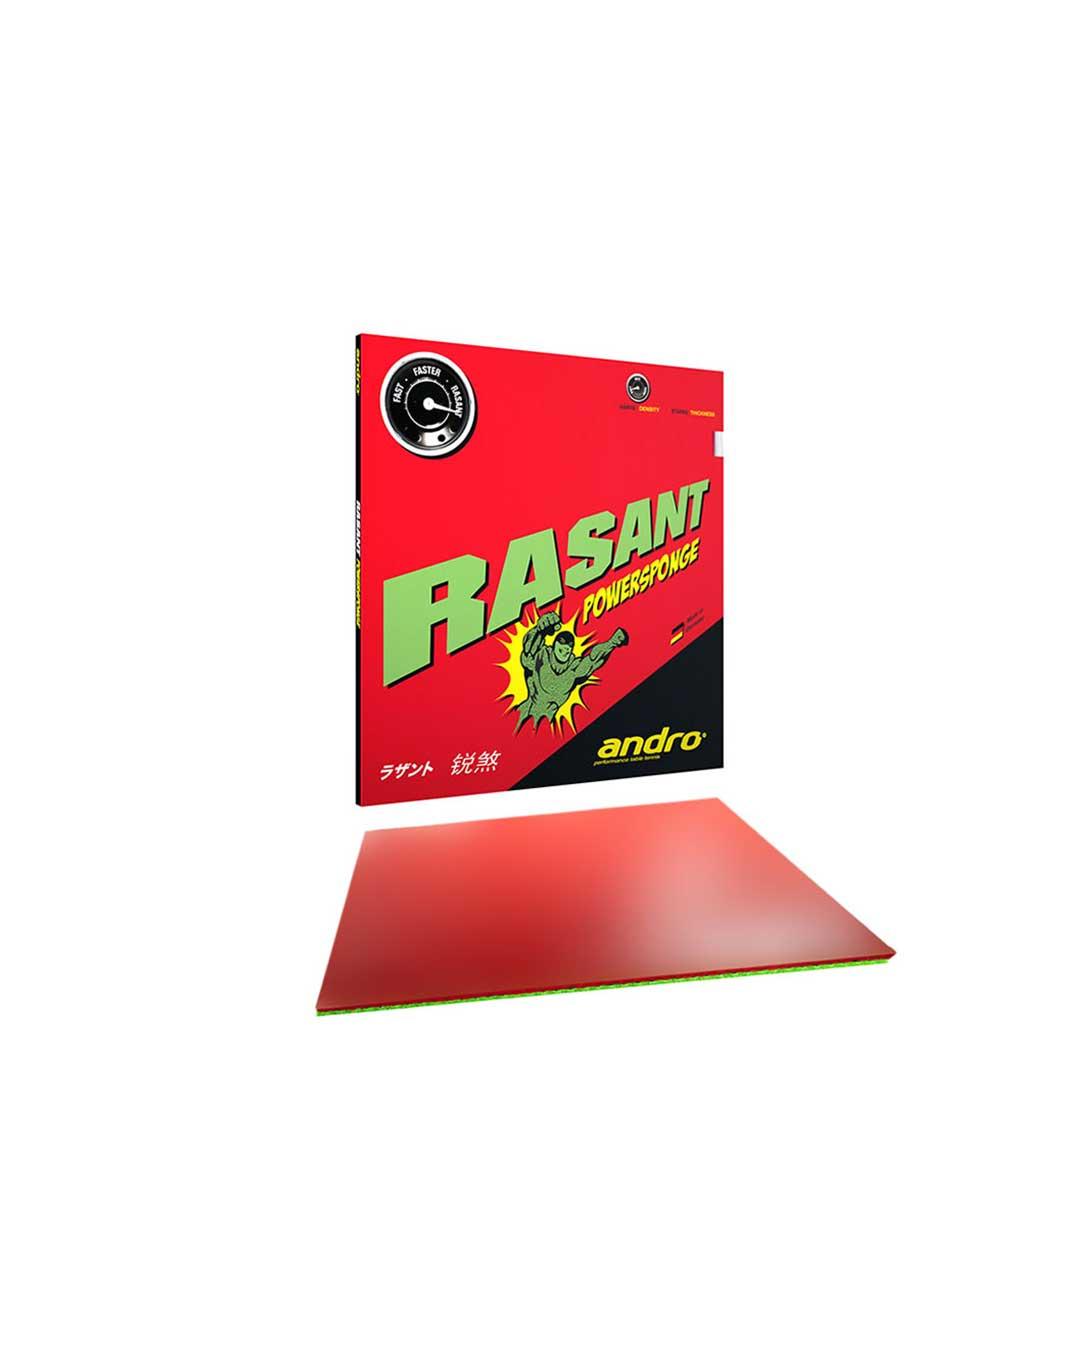 Goma Tenis de Mesa Andro Rasant Powersponge Red 2.1 mm